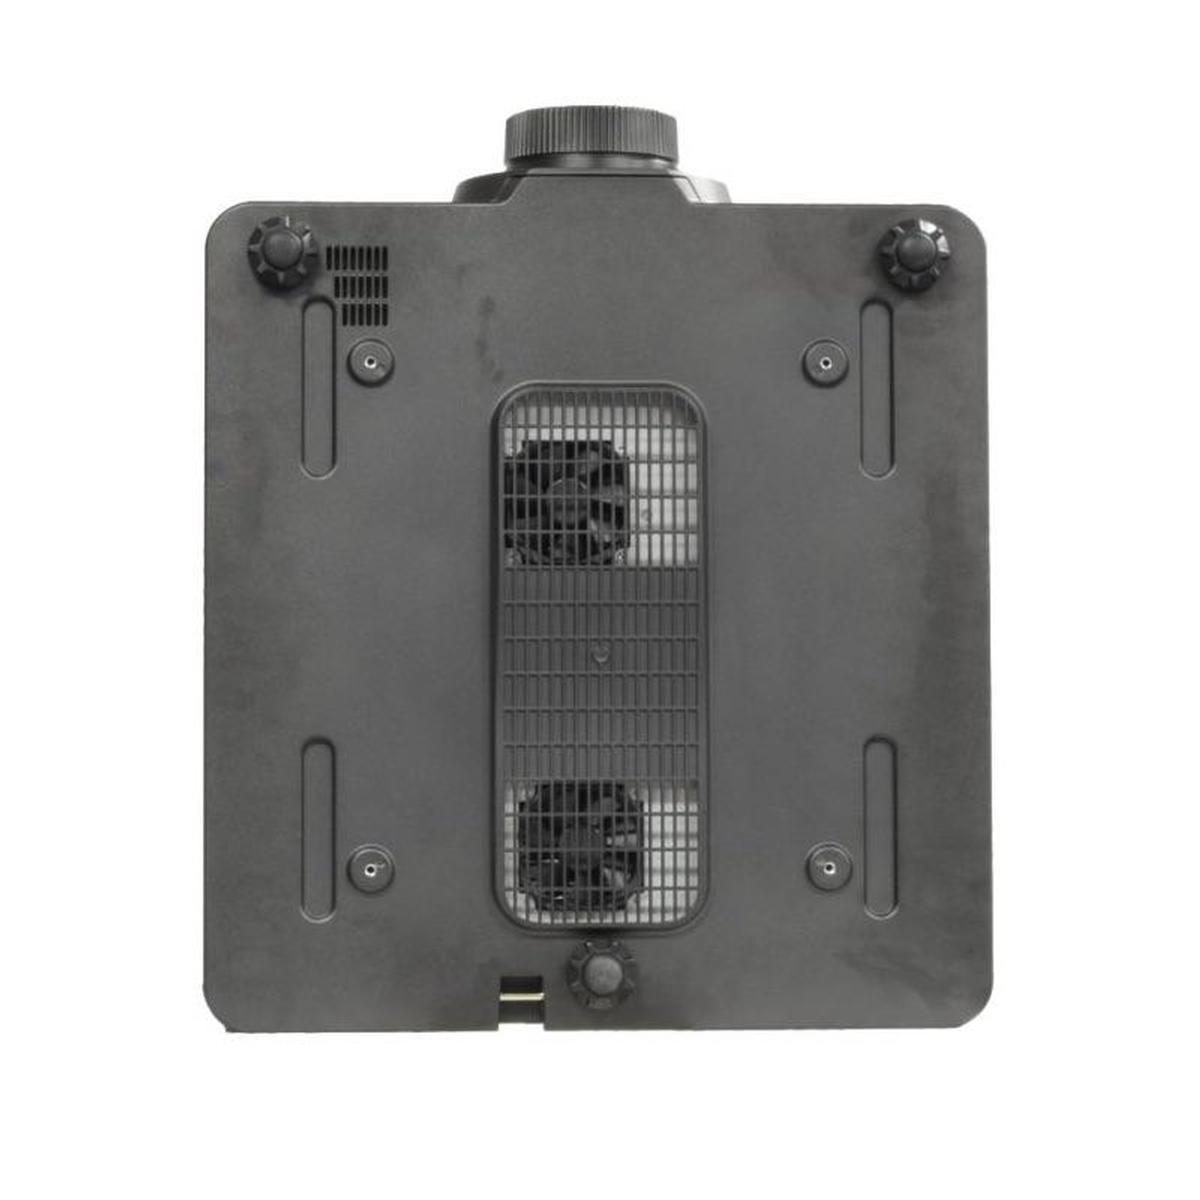 Eiki Ek 810u Laser Projector 8 000 Lumens Hdbaset Wuxga